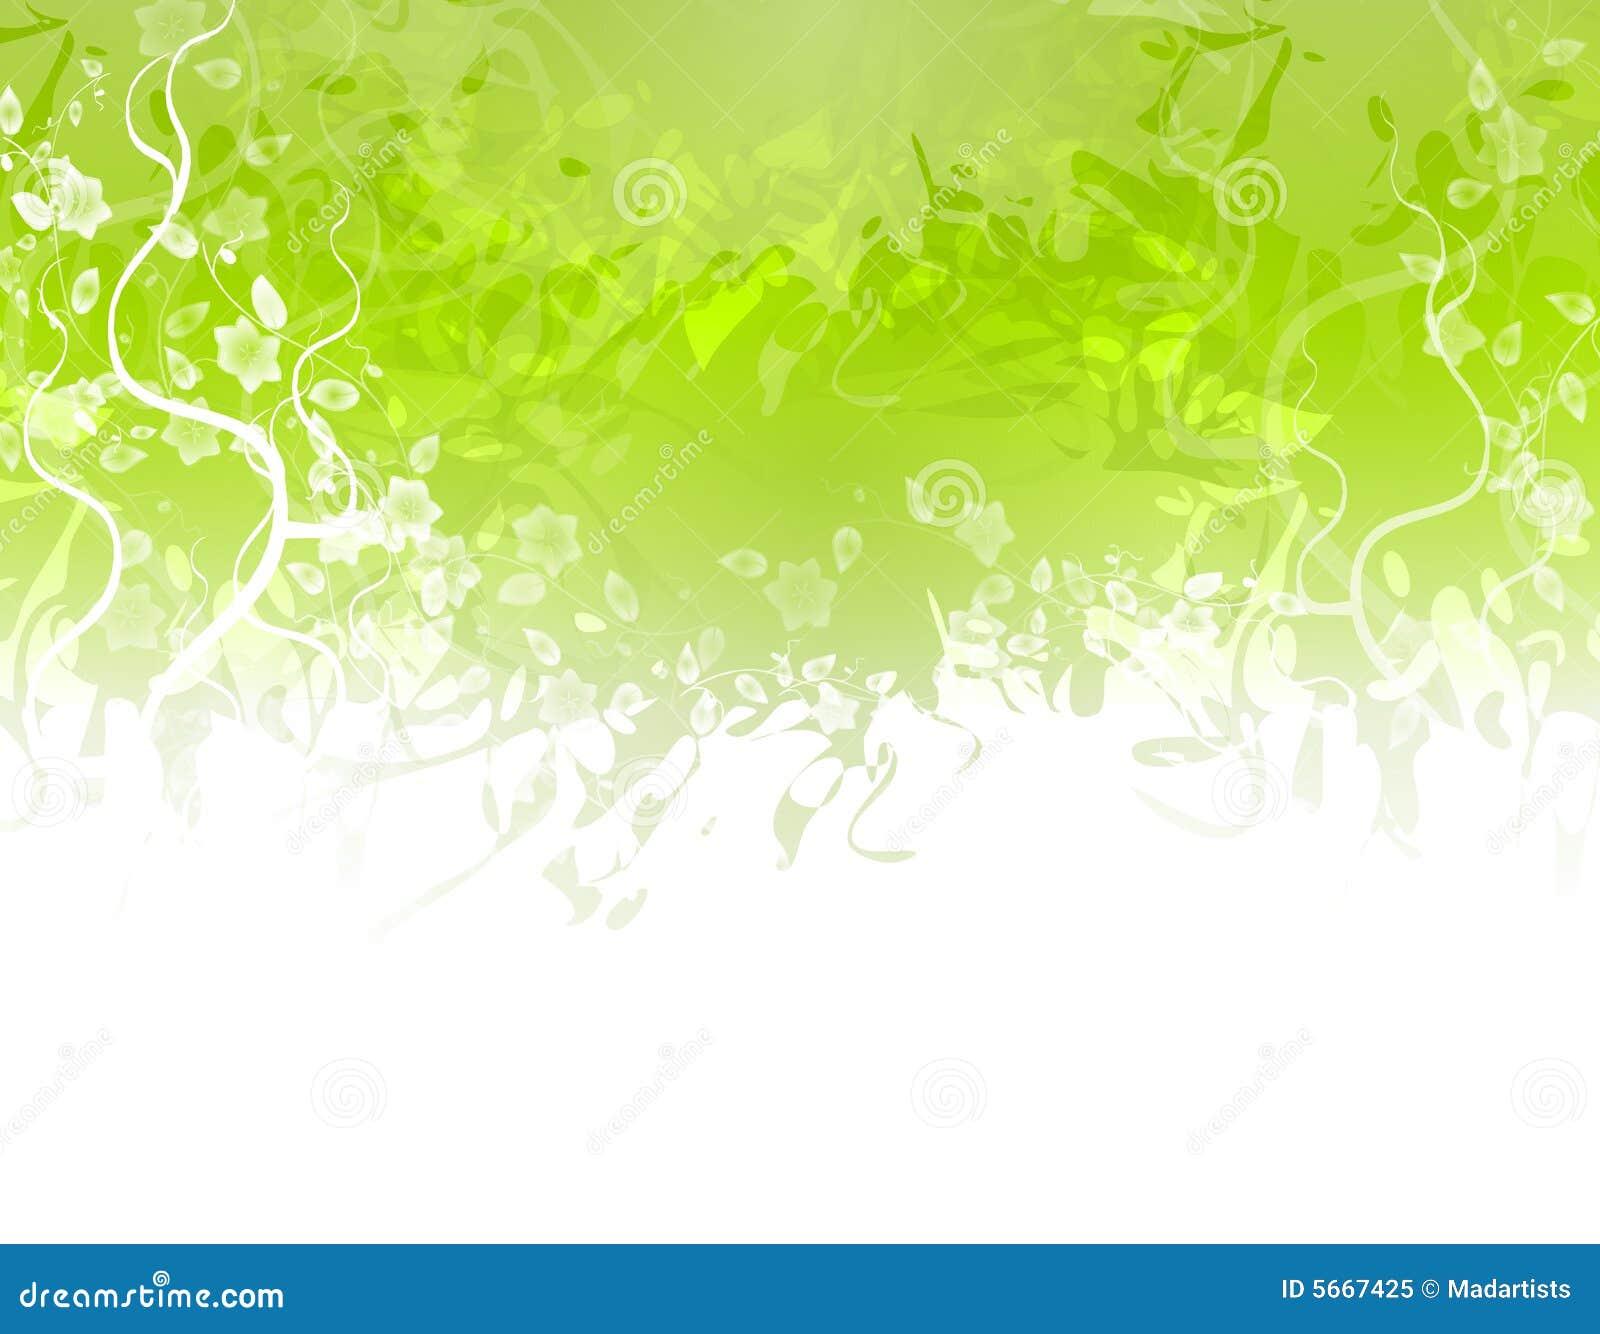 Kwiat granic zielone konsystencja